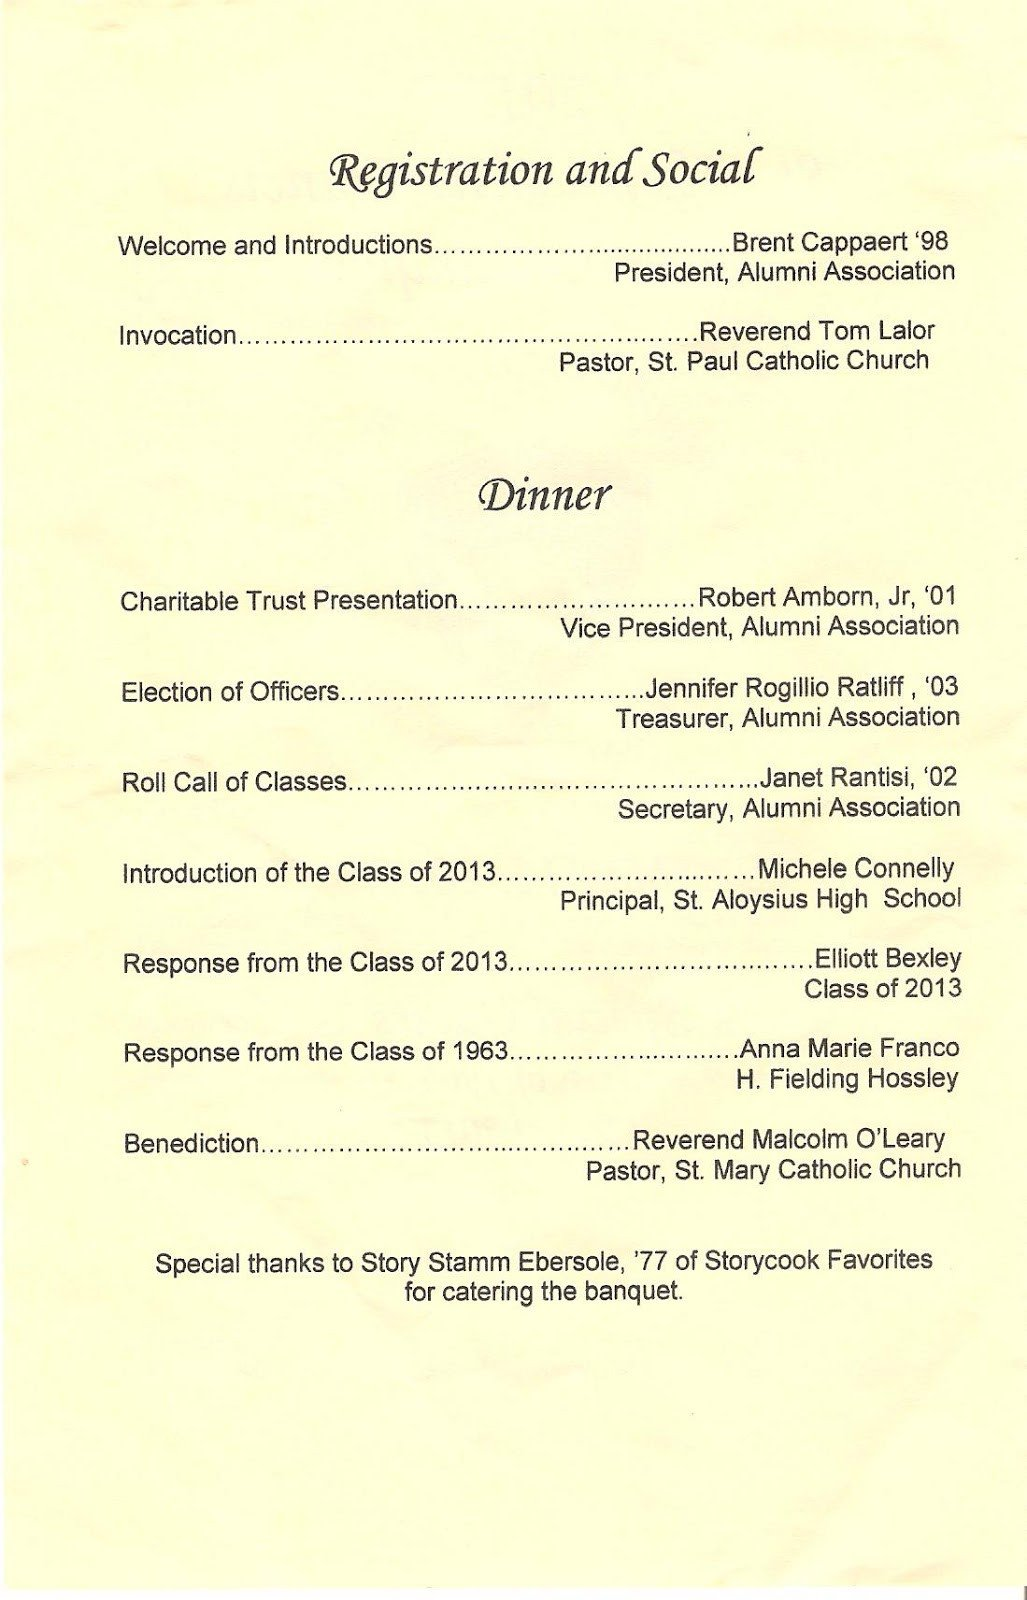 Family Reunion Banquet Program Sample Class Of 1959 2013 St Al St Francis Alumni Banquet